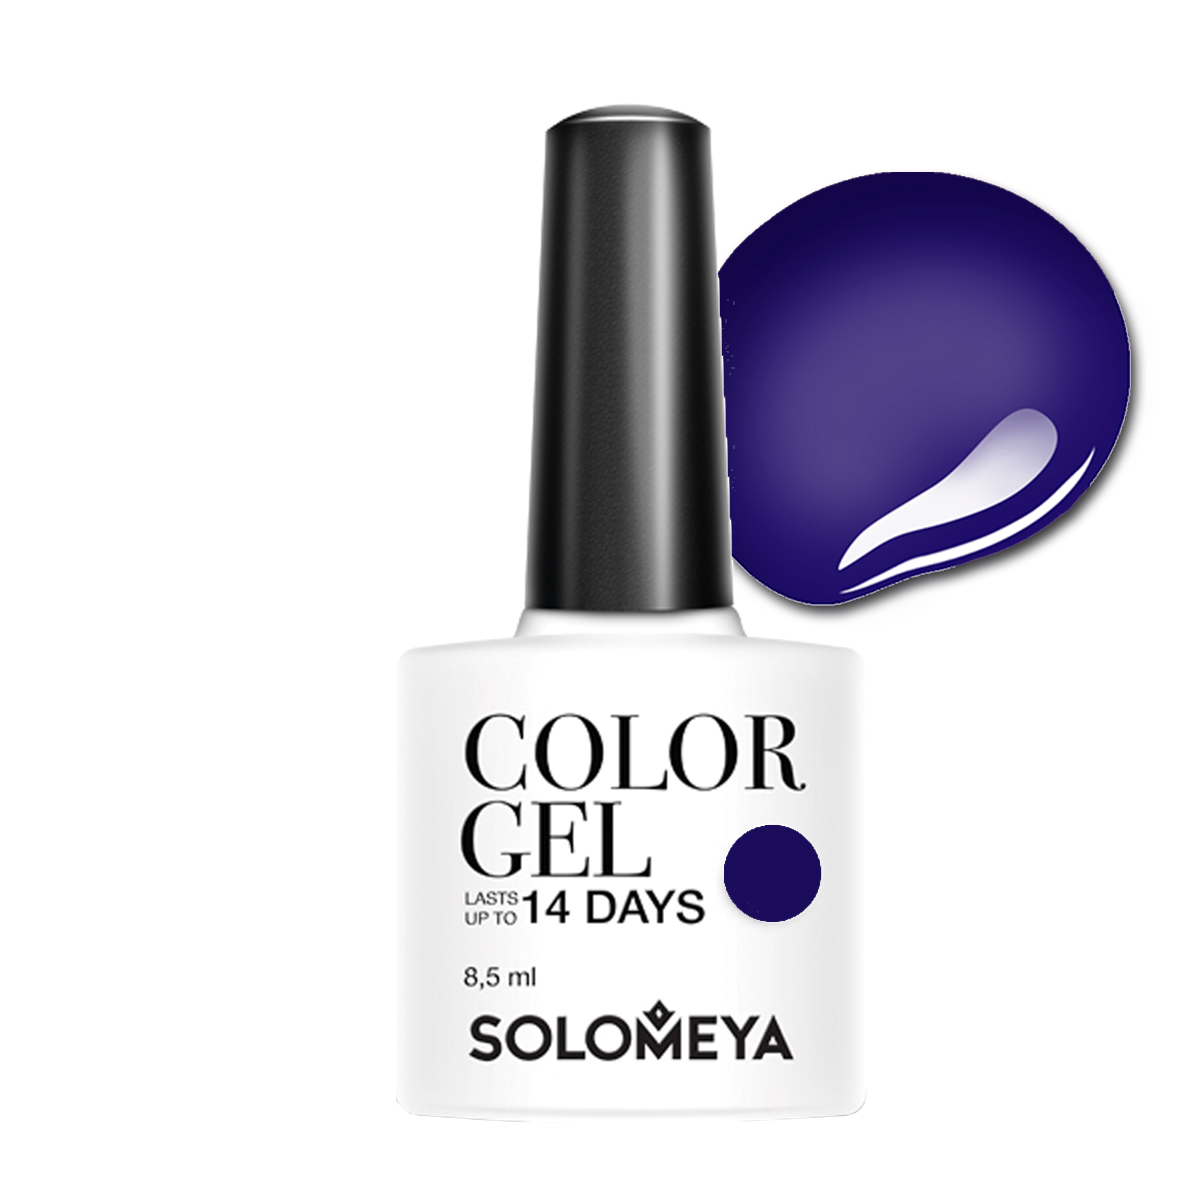 SOLOMEYA Гель-лак для ногтей SCG025 Шарлотта / Color Gel Charlotte 8,5 мл гель лак для ногтей solomeya royal family collection color gel scg025 цвет scg025 charlotte variant hex name 4c4186